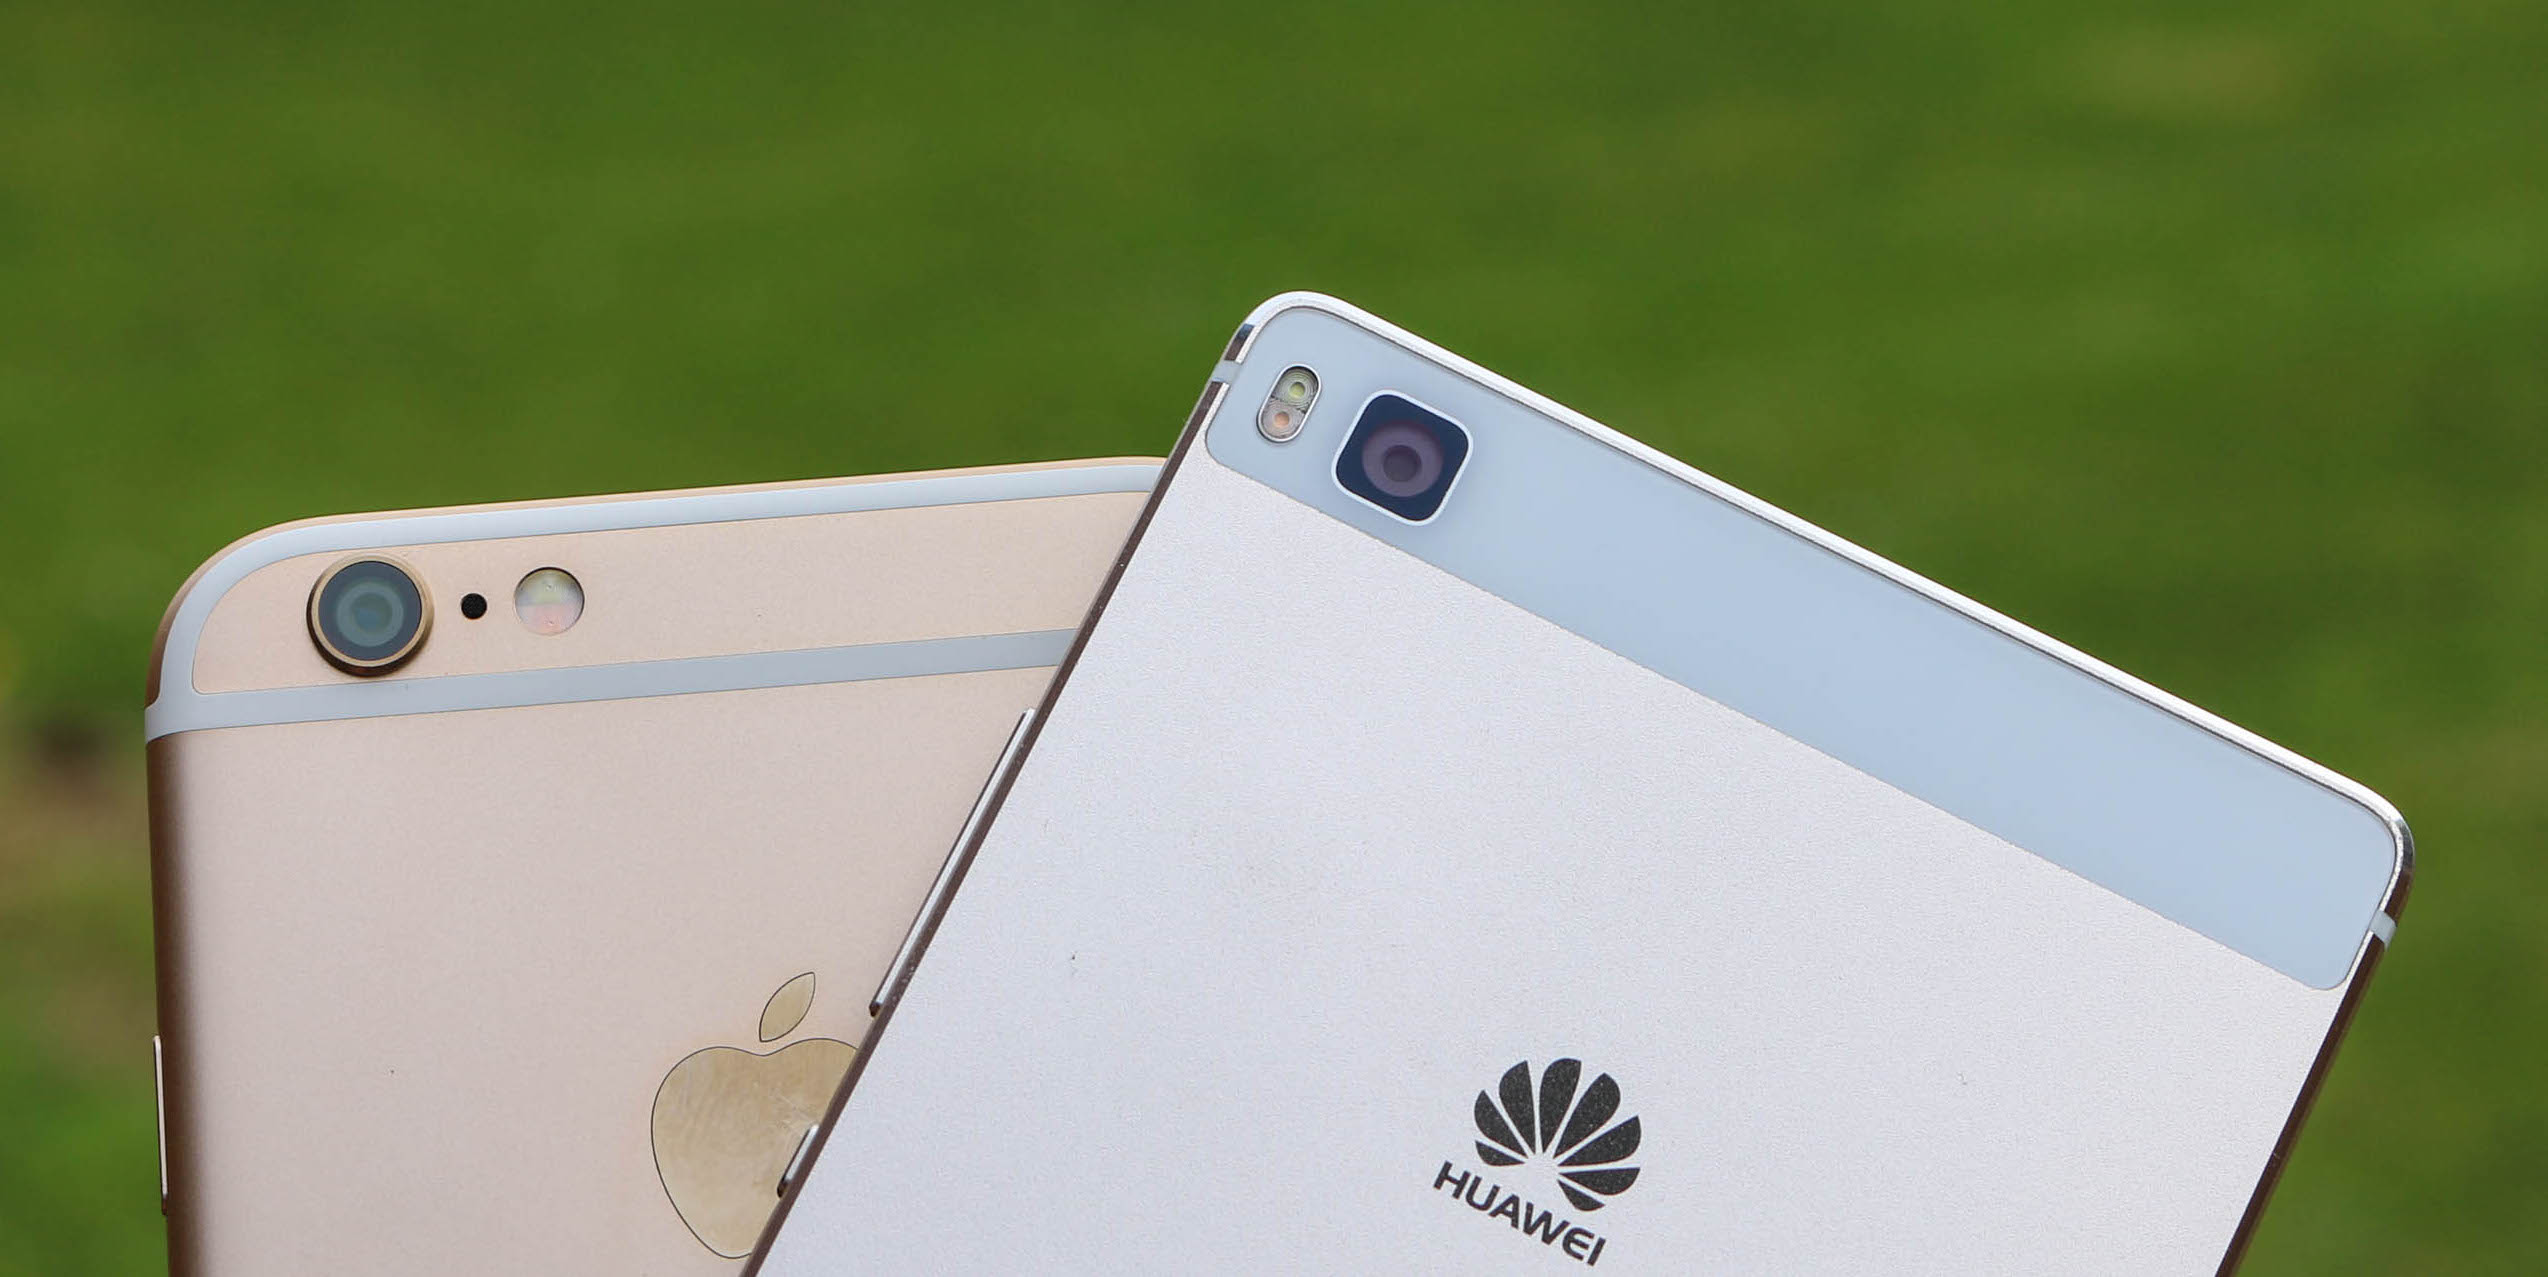 Huawei ненадолго опередил Apple по продажам